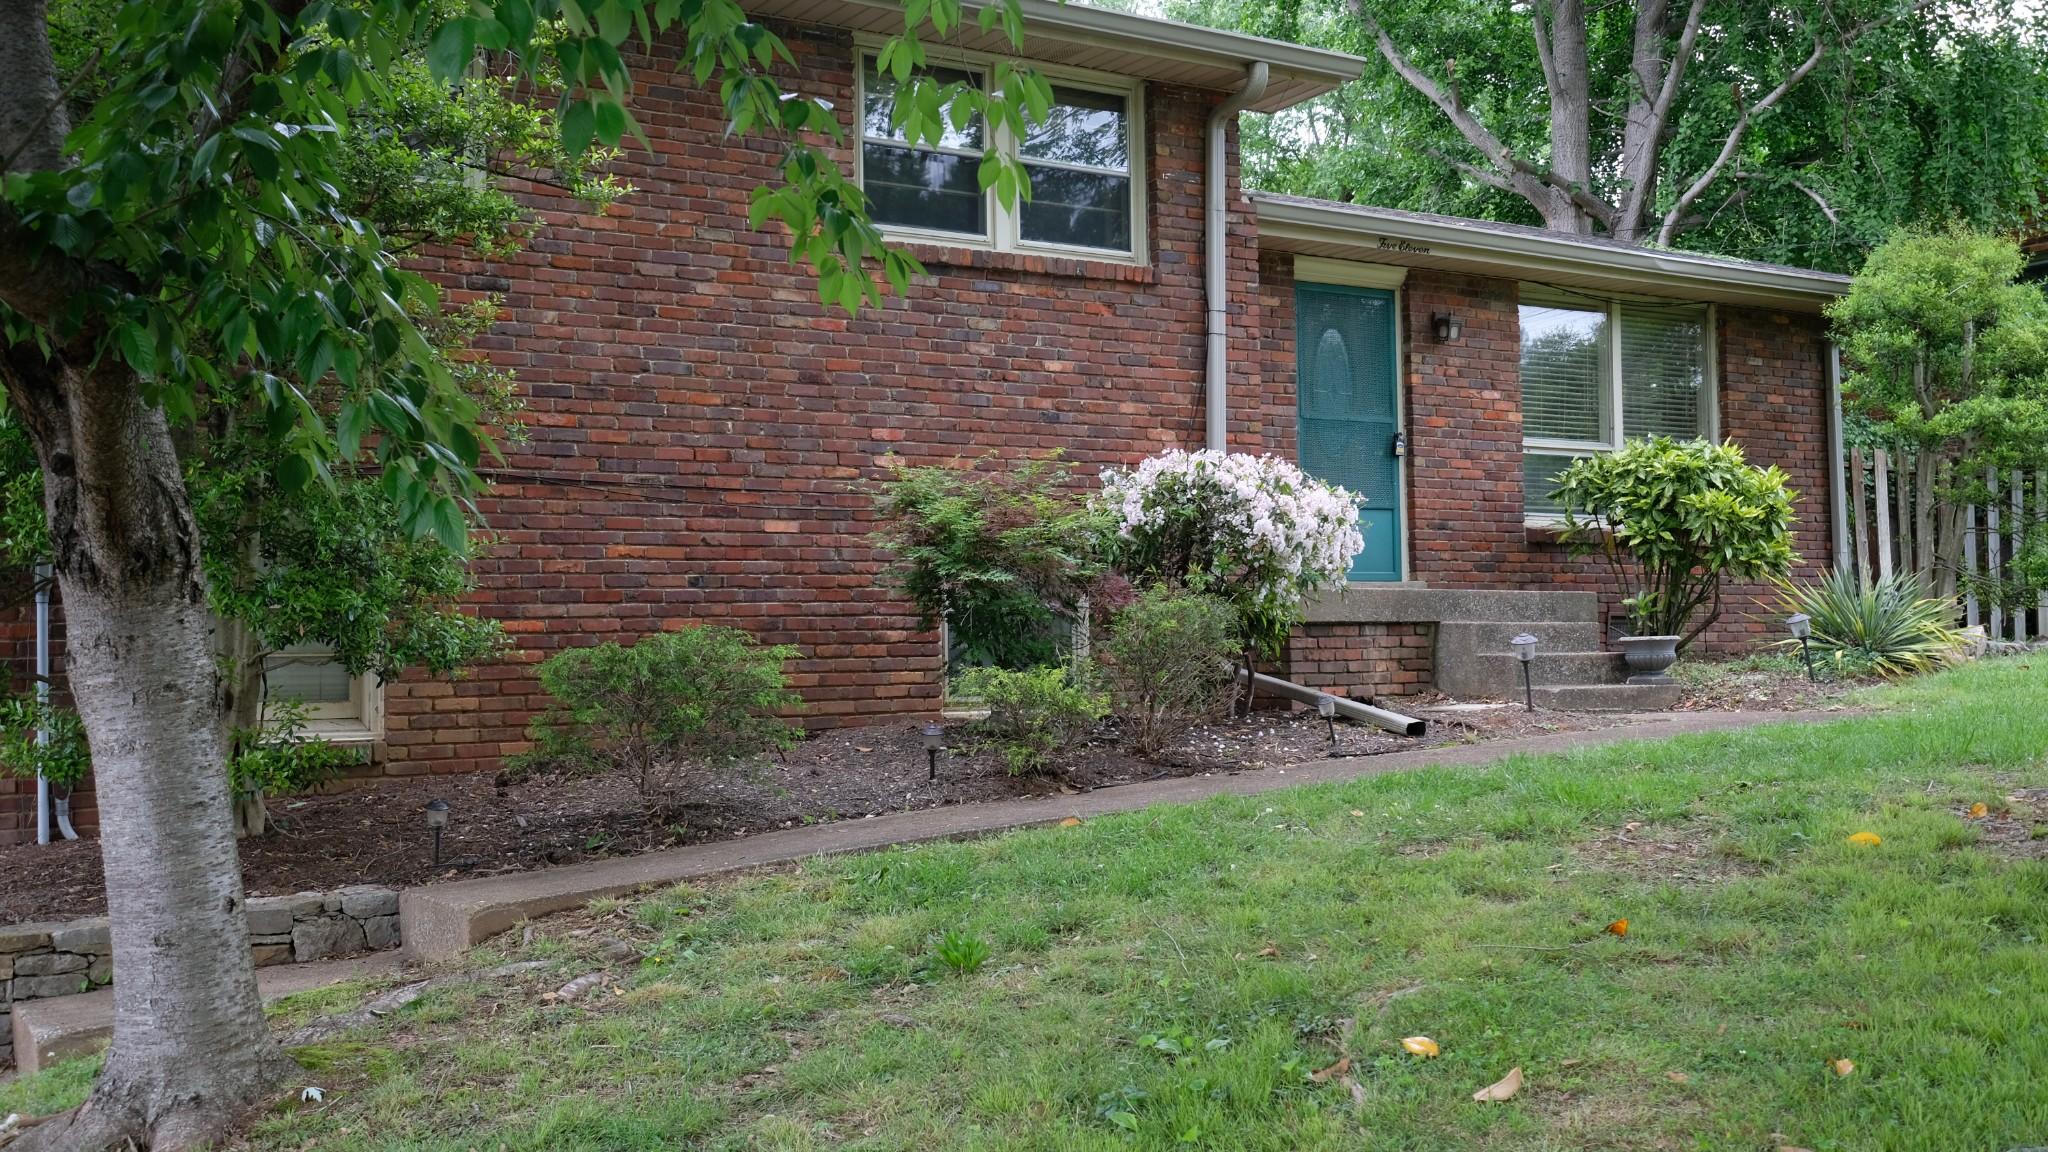 511 McDonald Dr Property Photo - Nashville, TN real estate listing